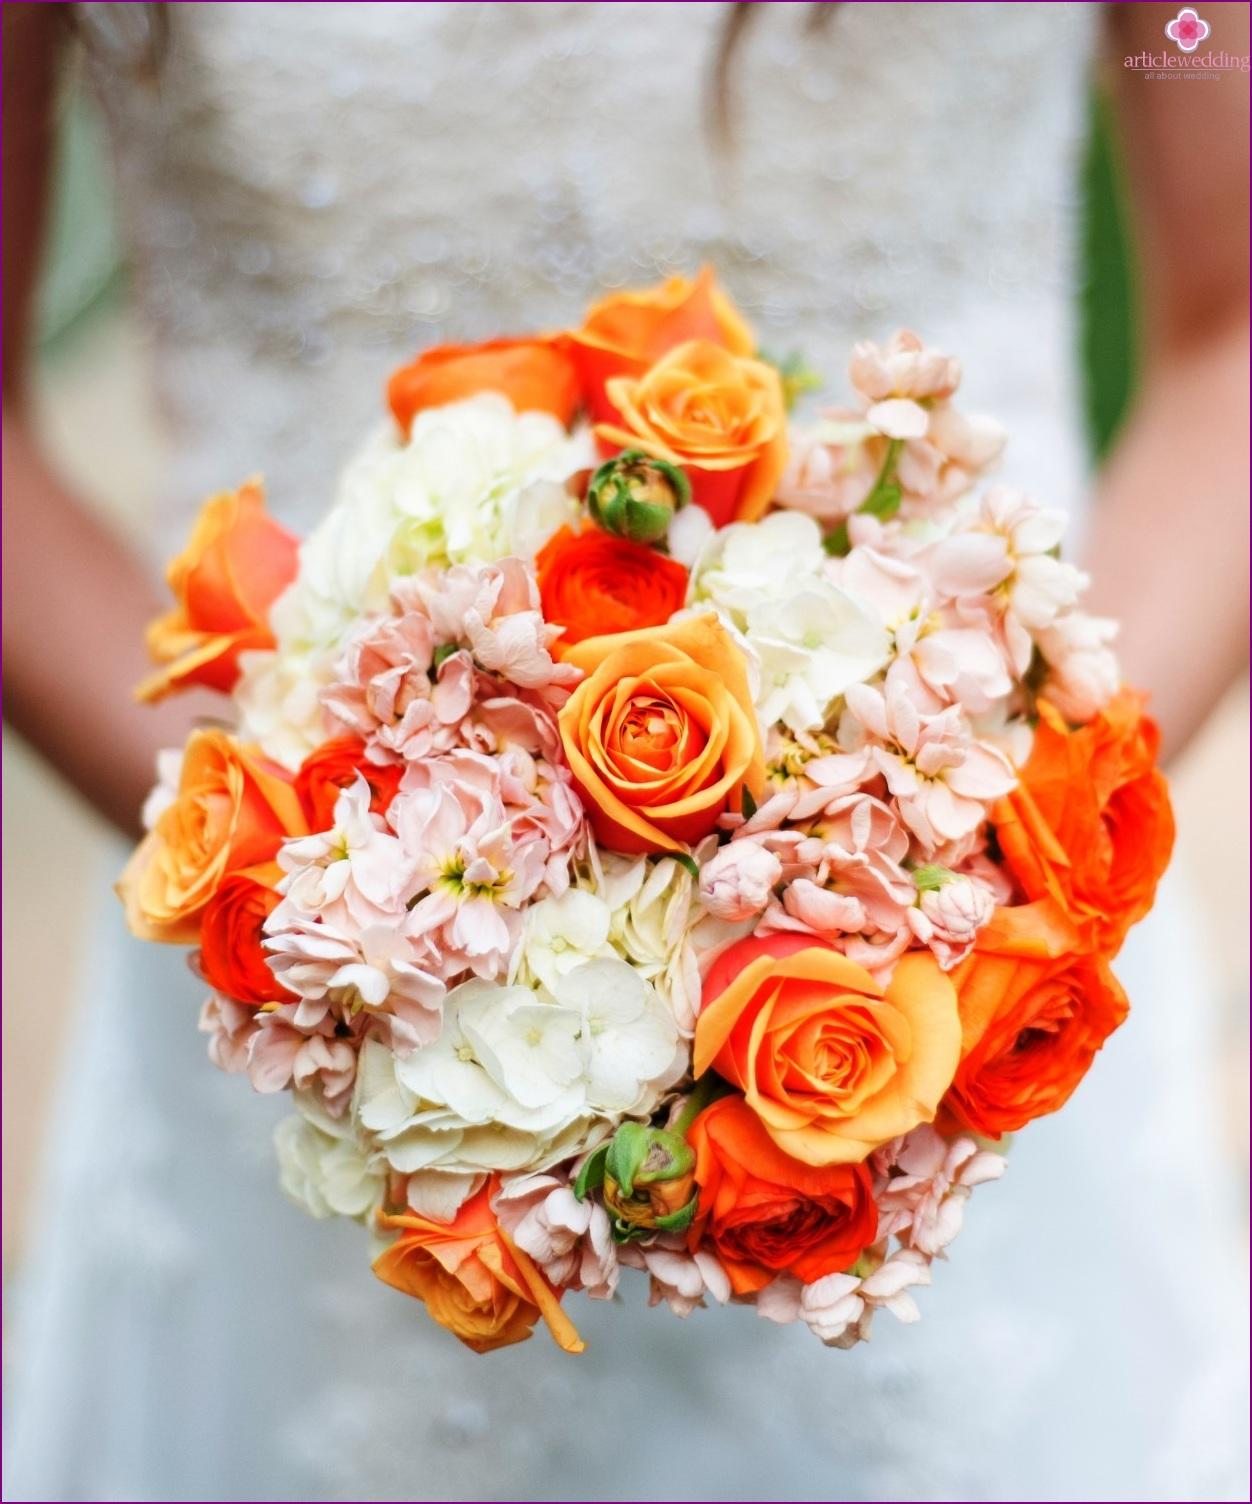 Orange flowers for tangerine wedding